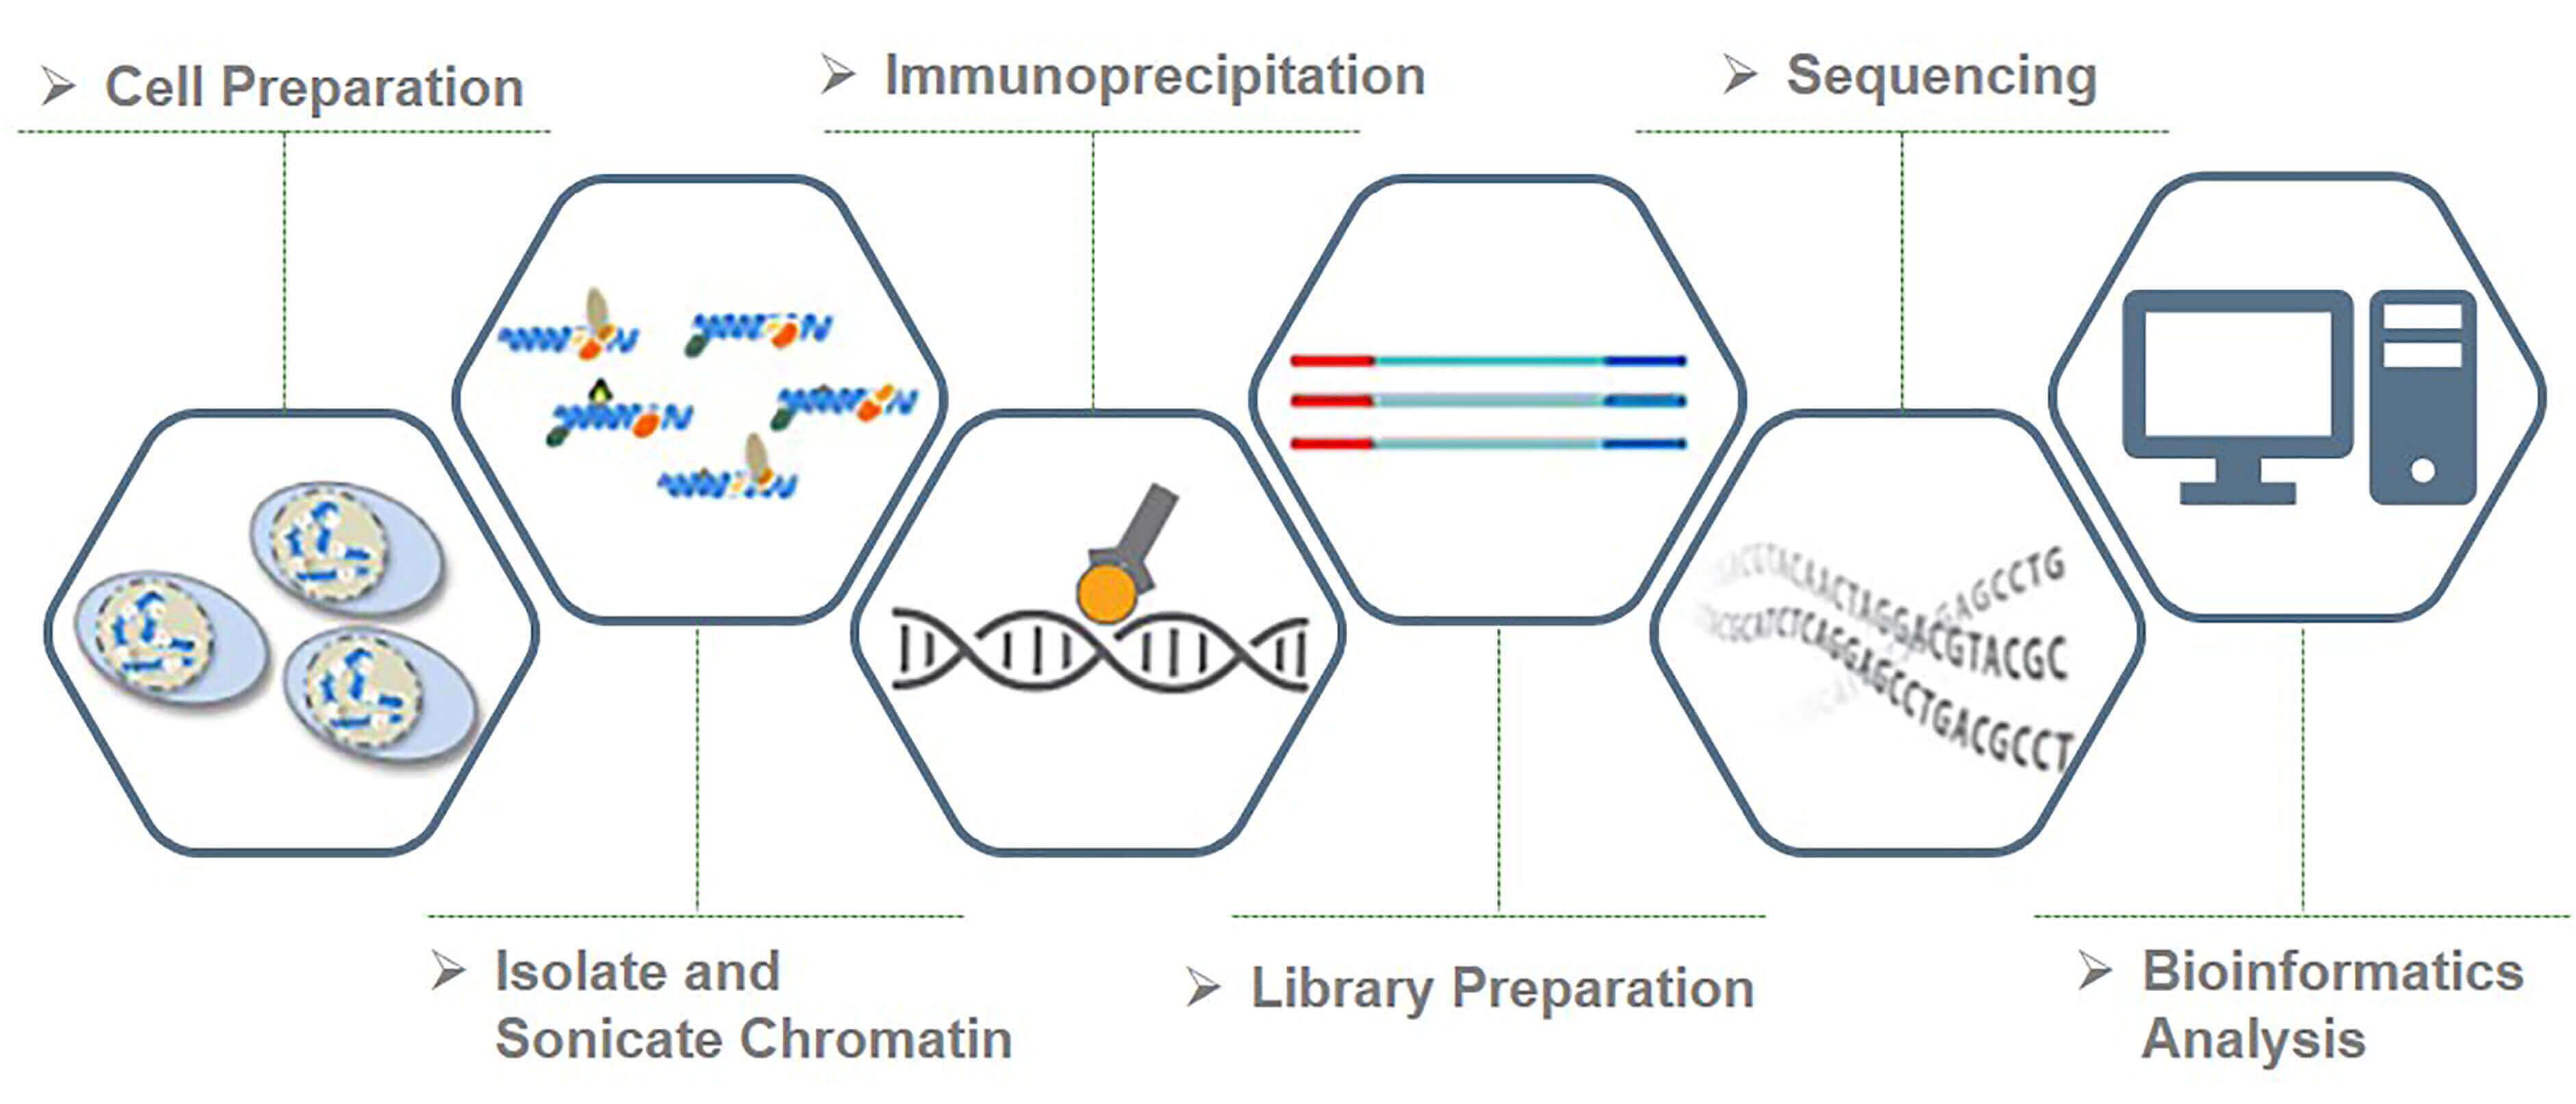 Workflow of histone ChIP-Seq service at Creative BioMart